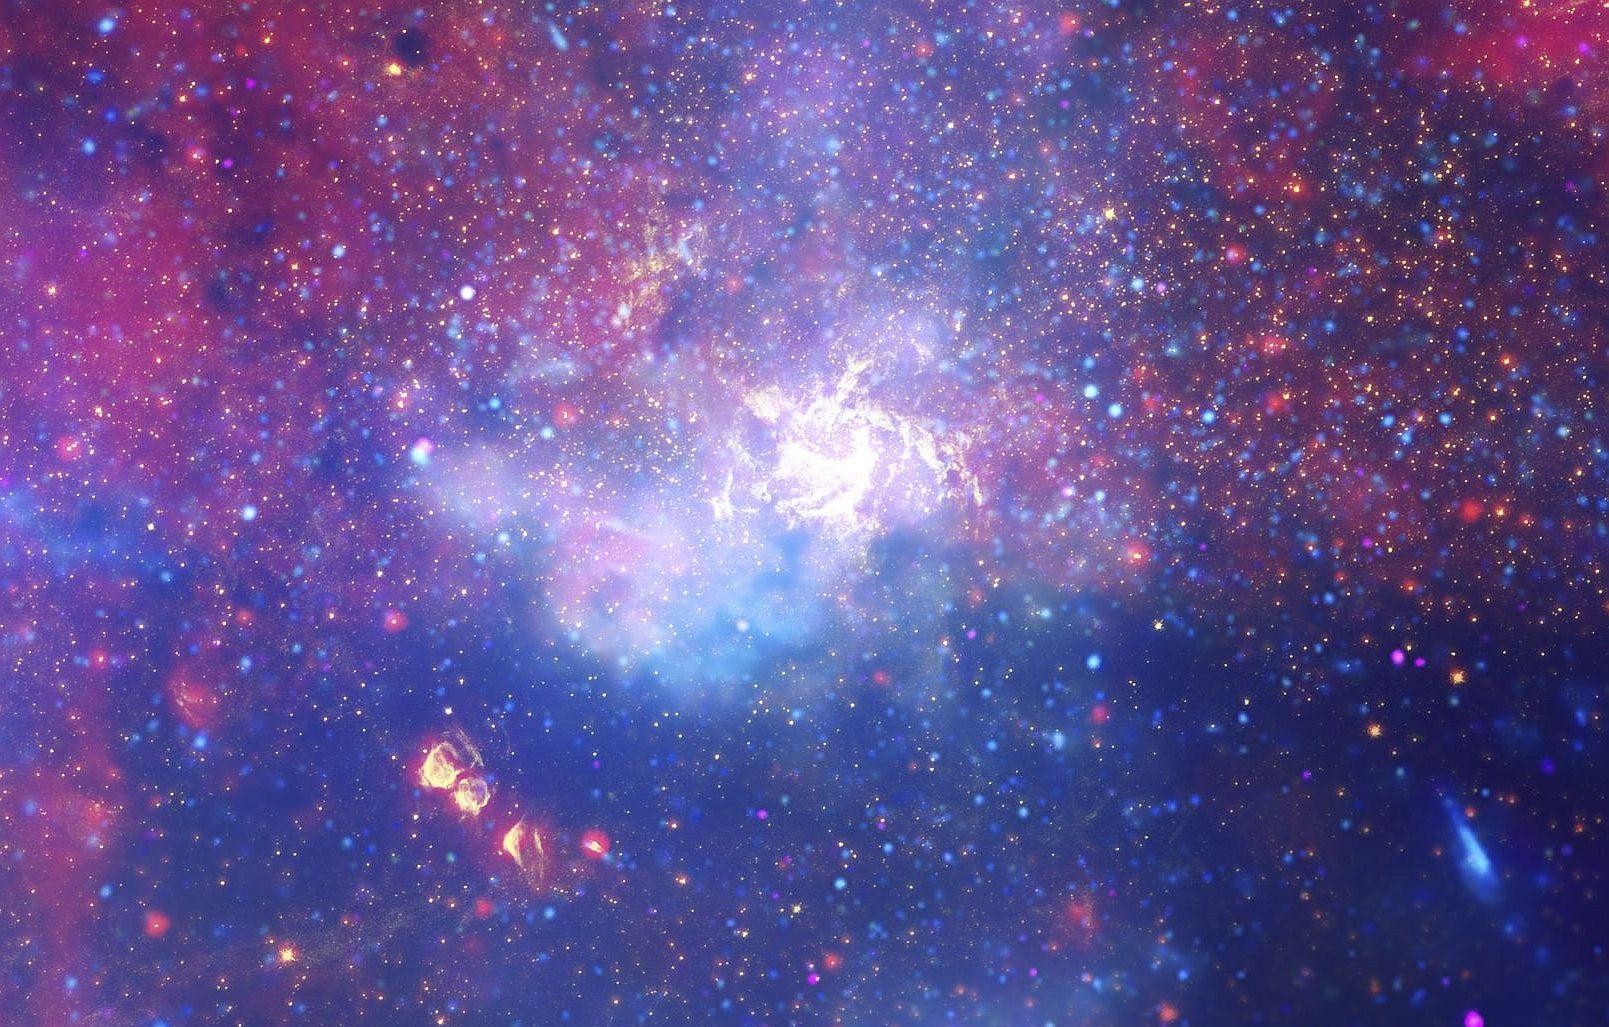 https://1.bp.blogspot.com/-_NkyAZk35RU/YNzUTV_n-1I/AAAAAAAAFaE/zHzxjso53QElUayFz5og4ACq1ElXXPp0wCLcBGAsYHQ/s1609/Galactic%2BCenter1.jpg